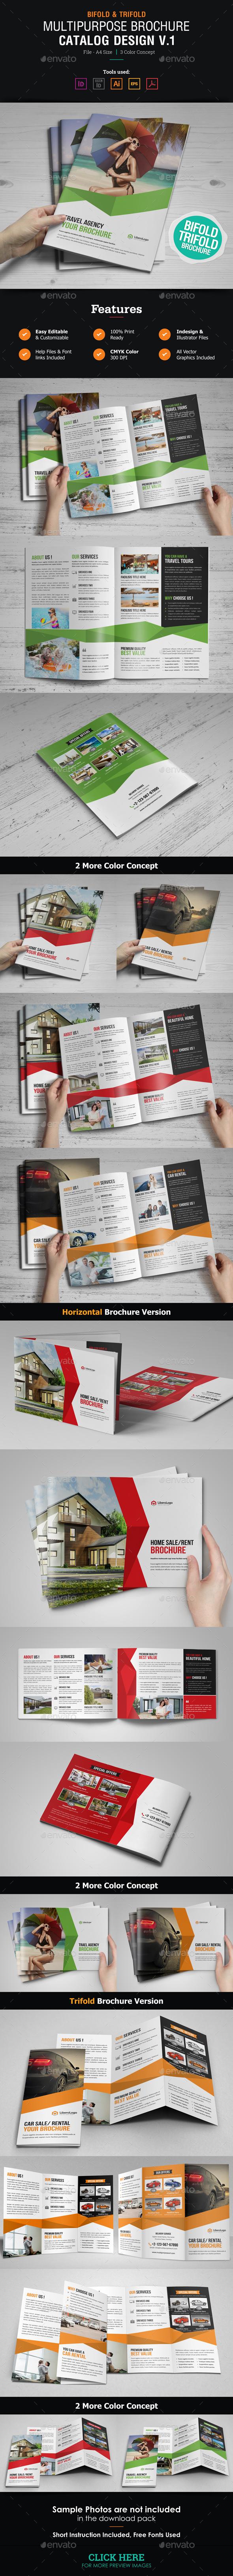 Multipurpose Brochure Catalog Design - Corporate Brochures